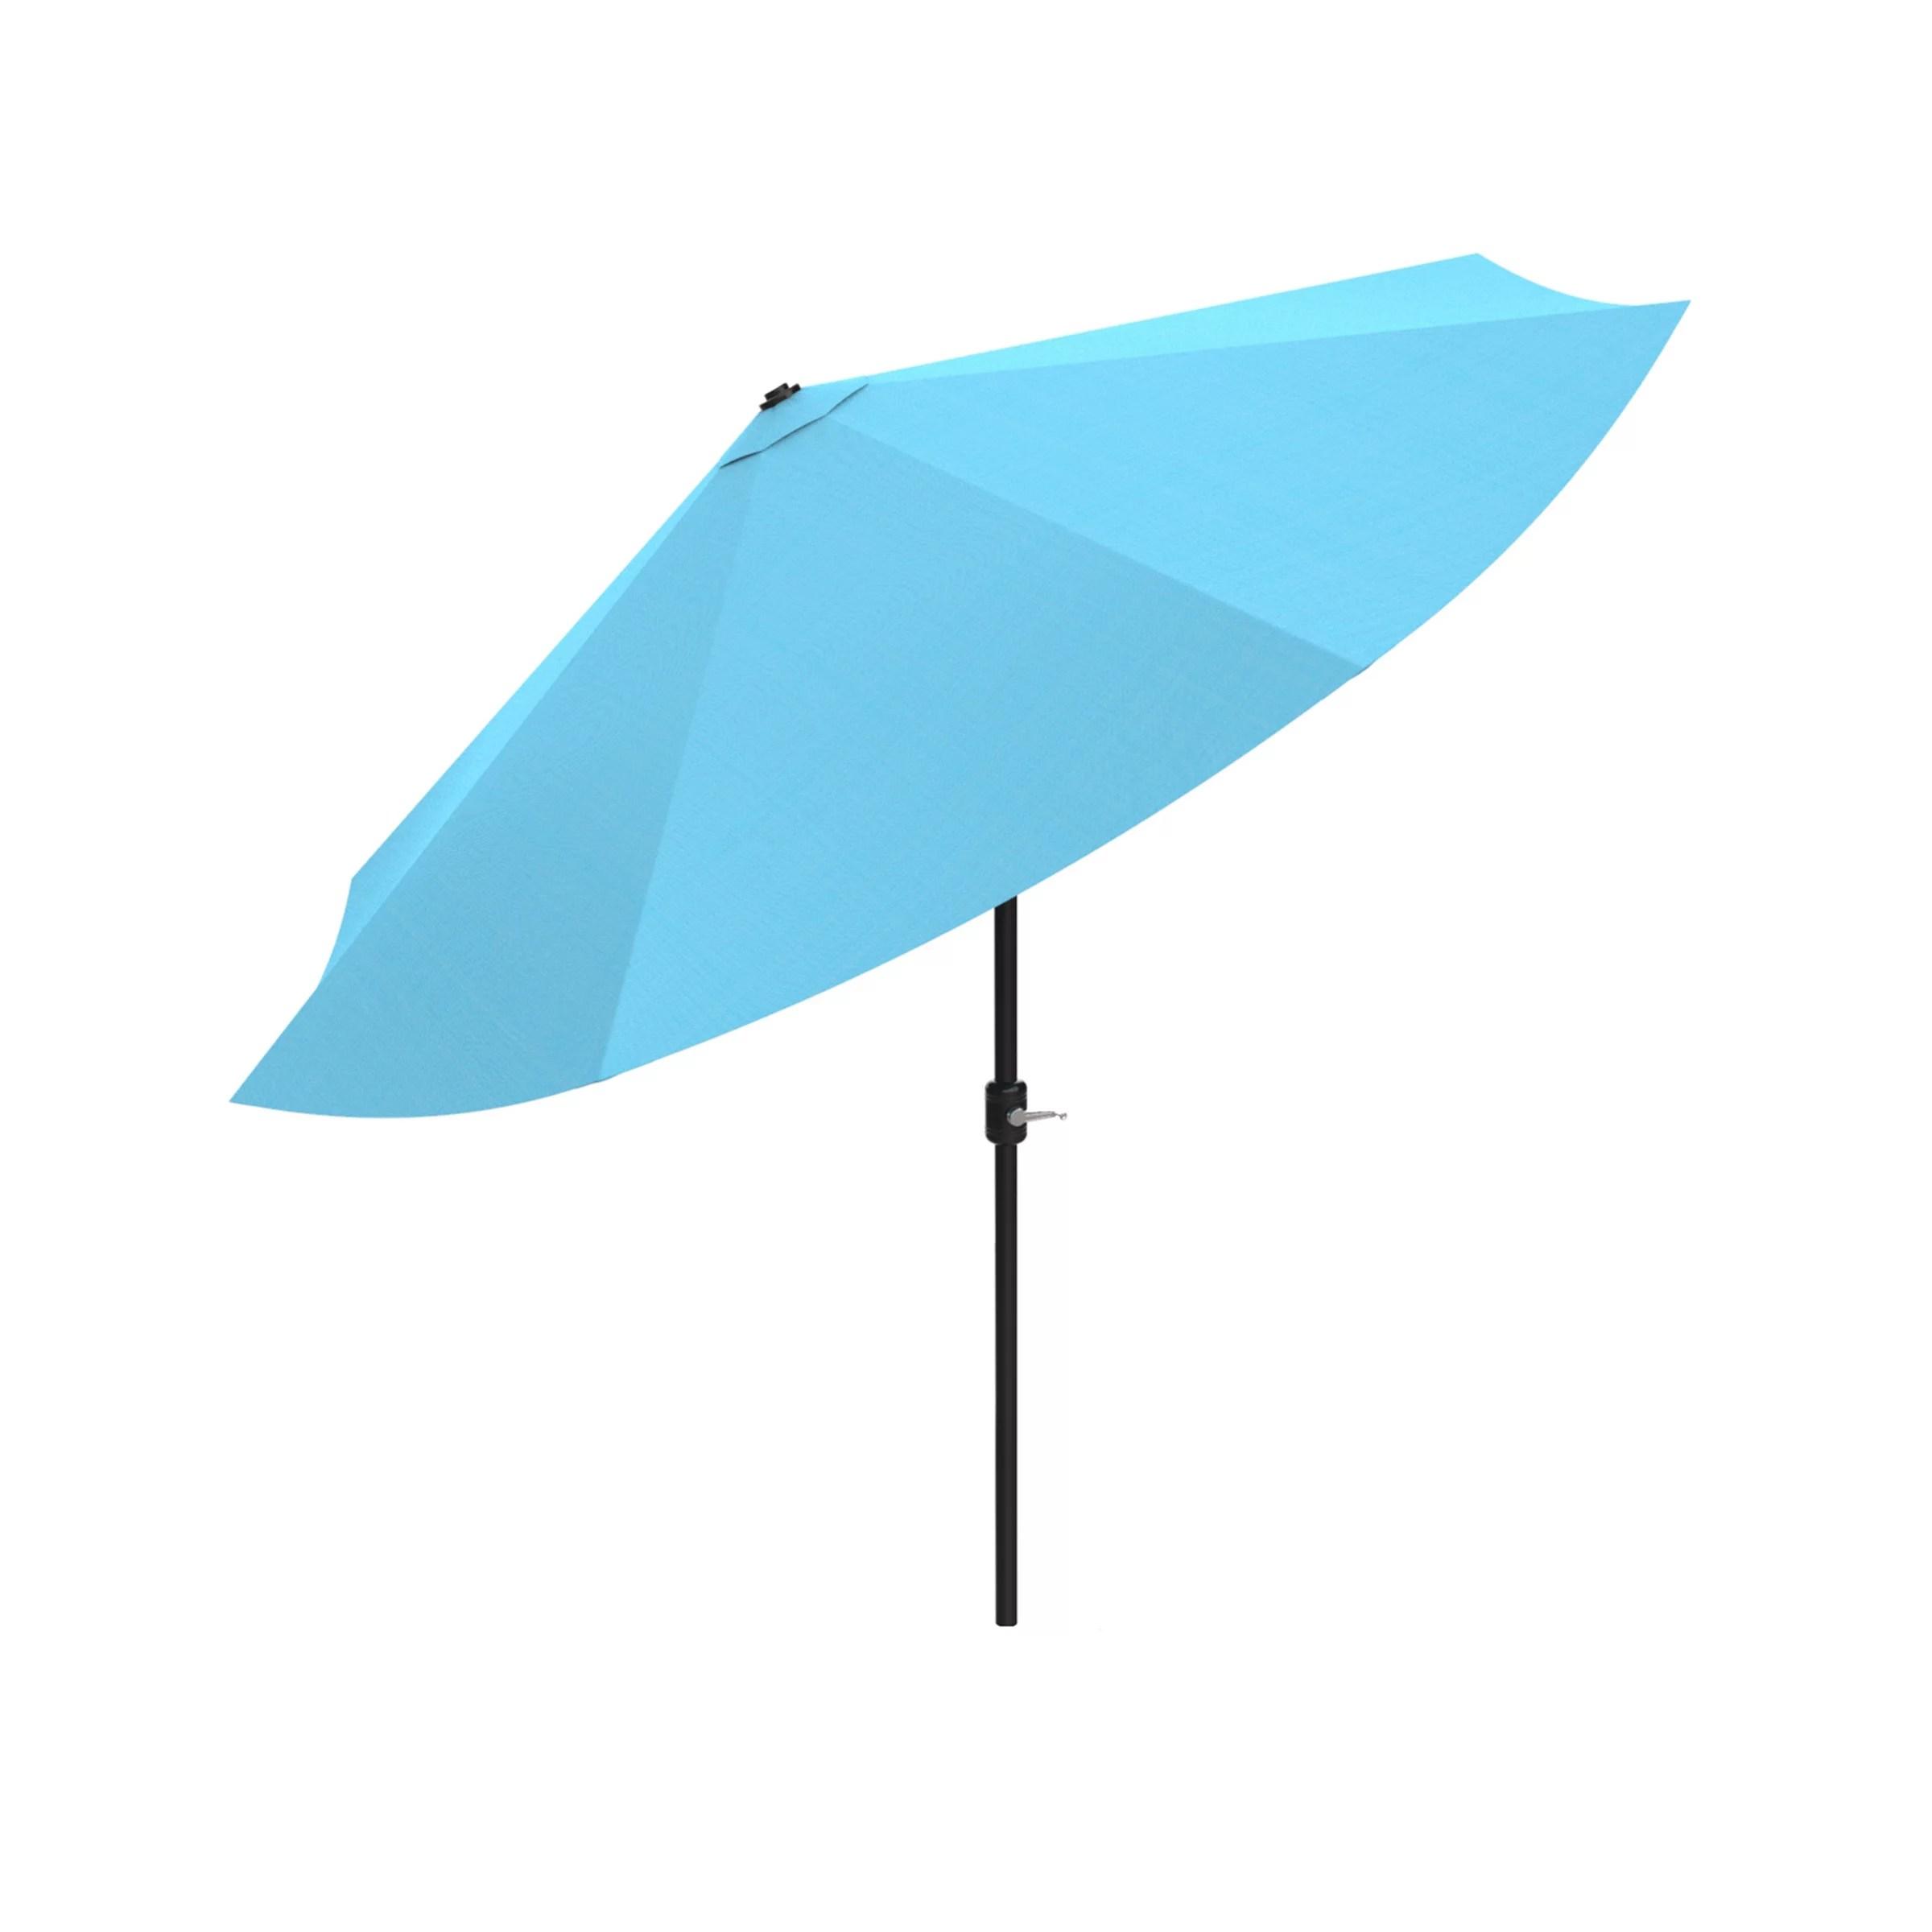 pure garden 10 easy crank auto tilt patio umbrella multiple colors